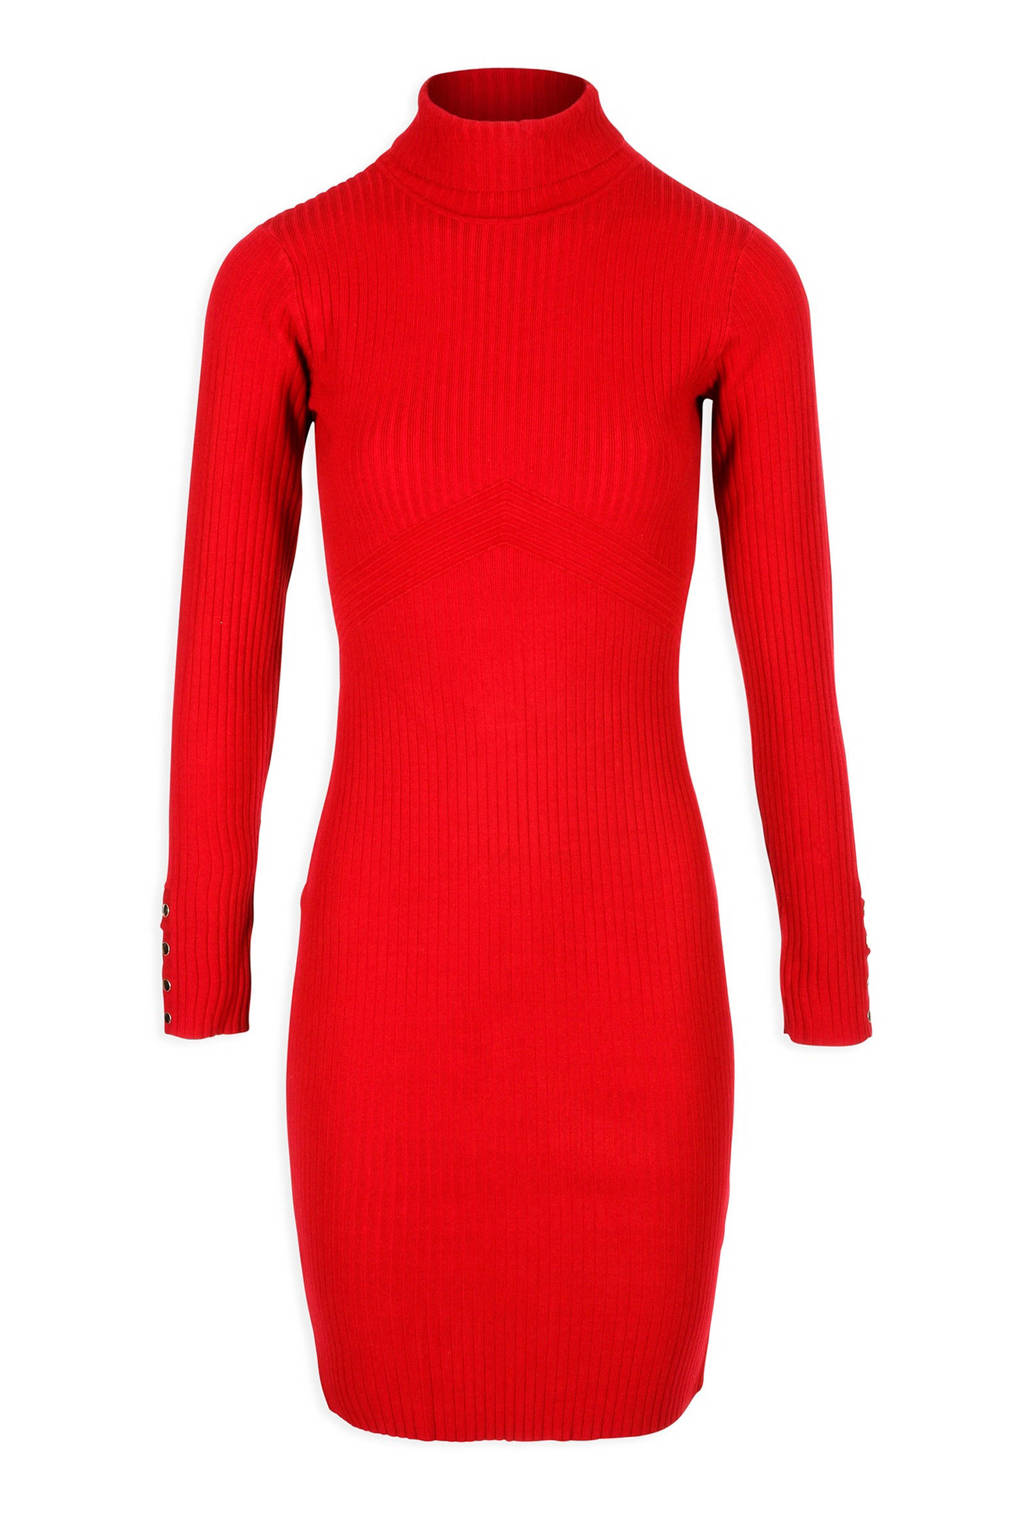 fbe5c9332abfc1 Morgan gebreide jurk rood